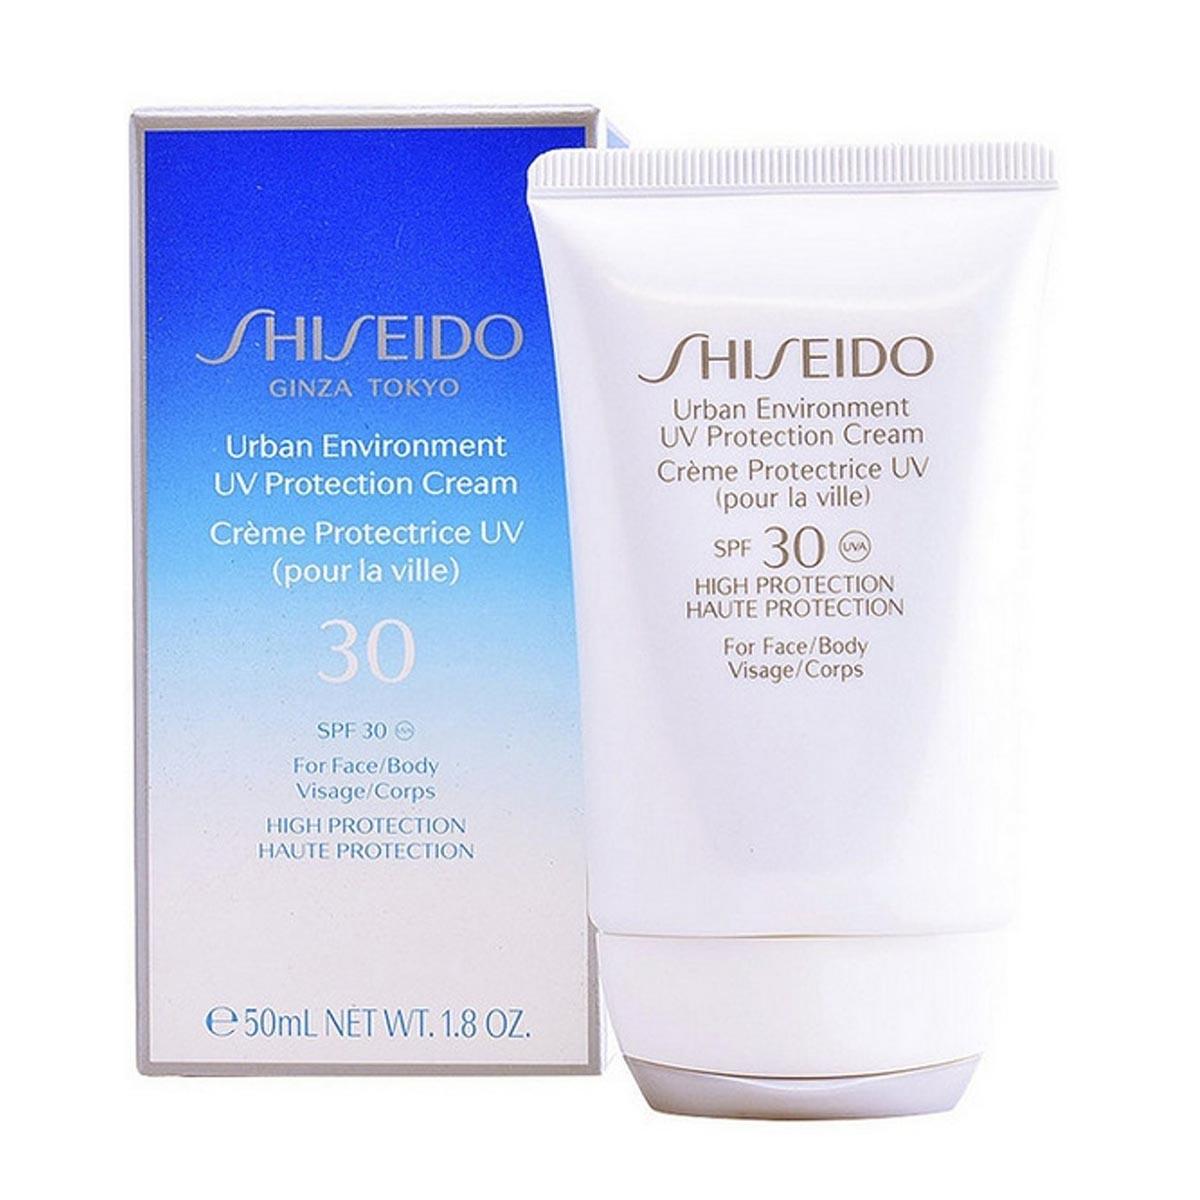 Shiseido urban environment uv protection cream spf30 50ml